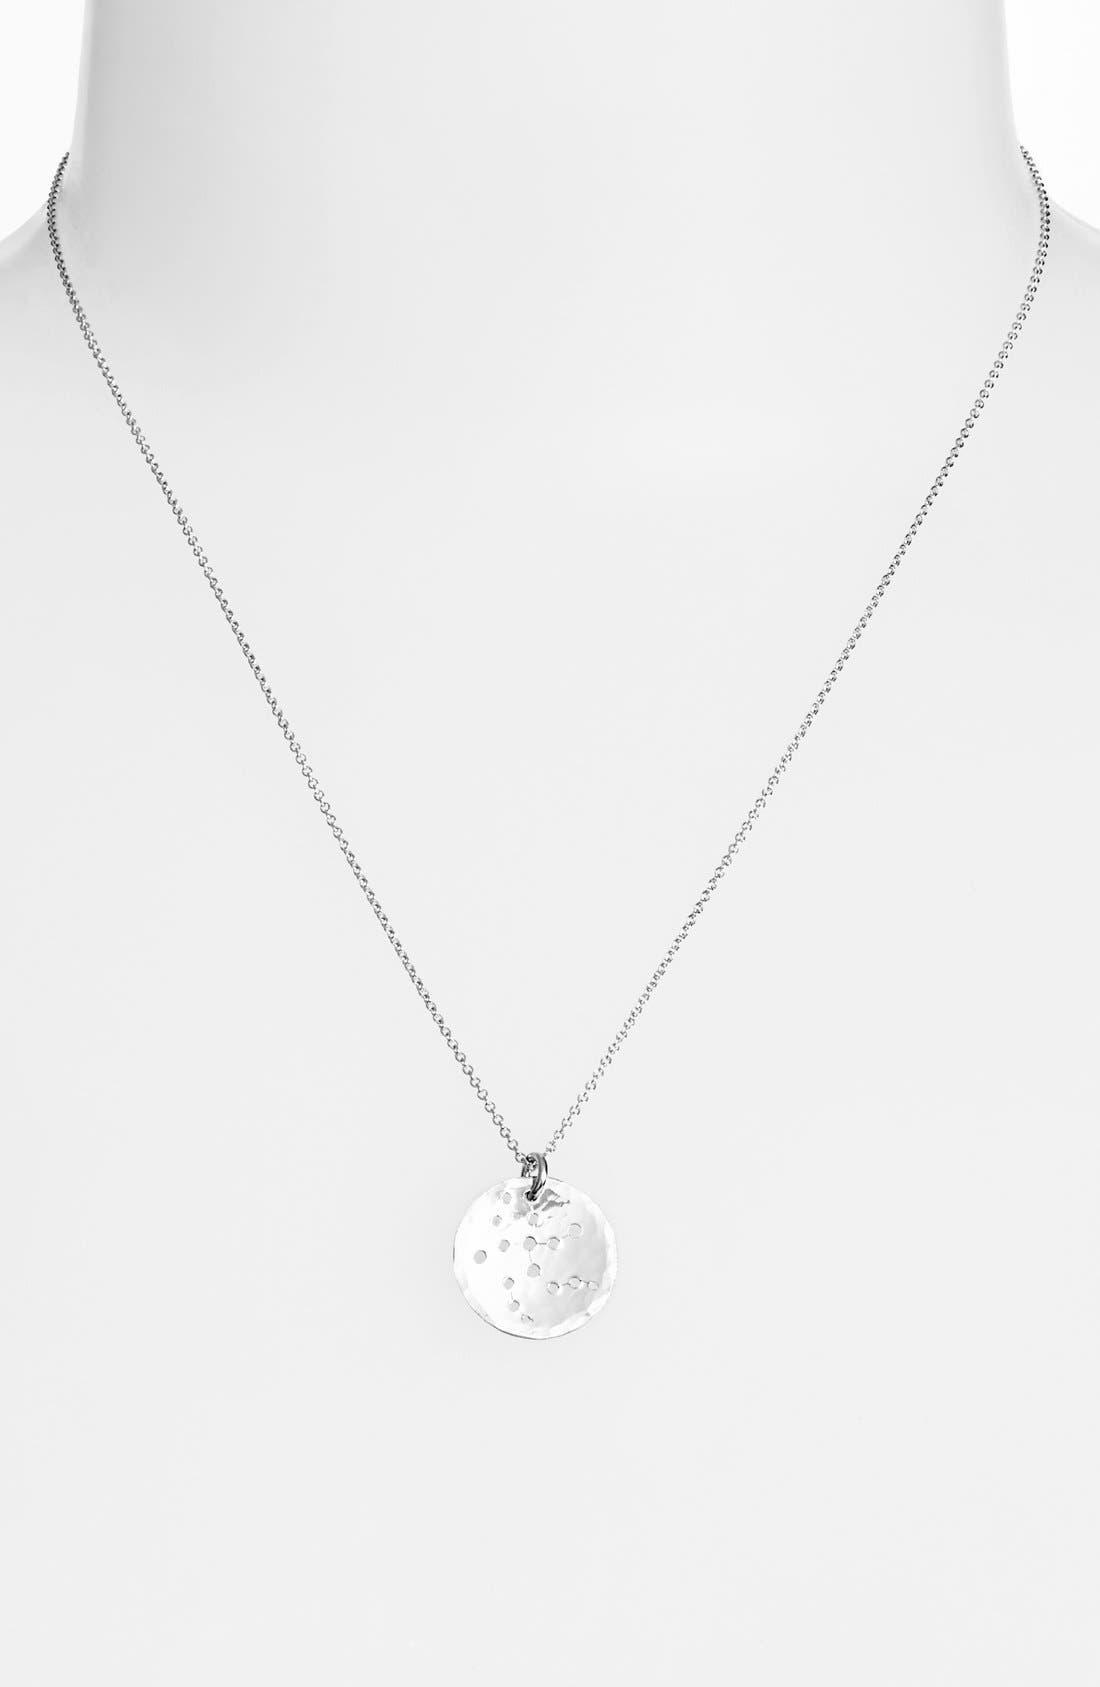 Ija 'Small Zodiac' Sterling Silver Necklace,                             Main thumbnail 6, color,